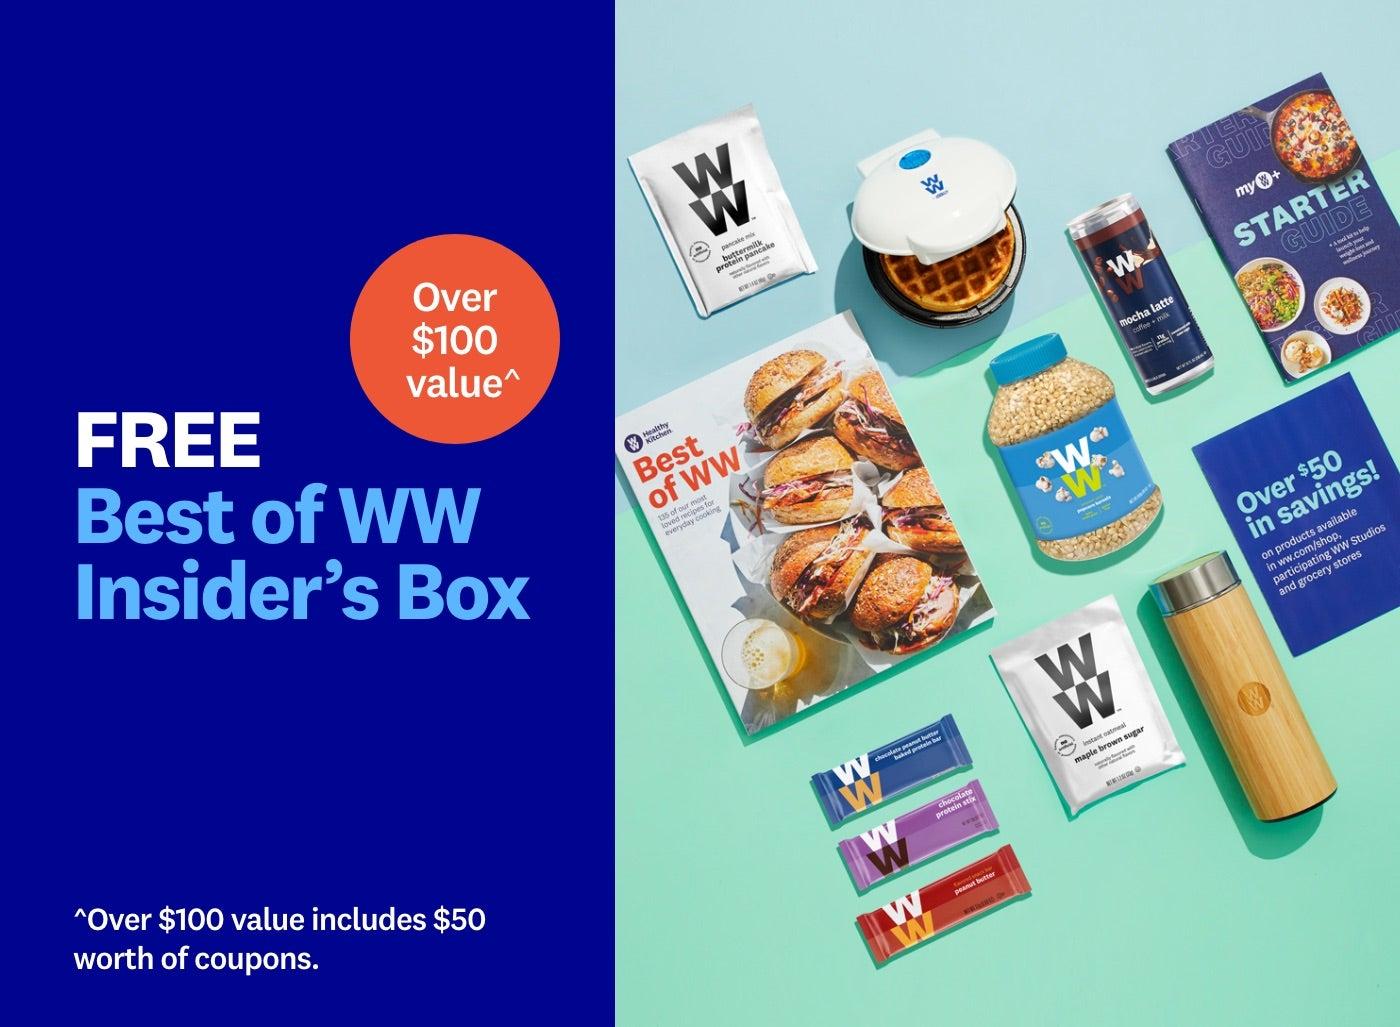 Get a free Best of WW Insider's Box.